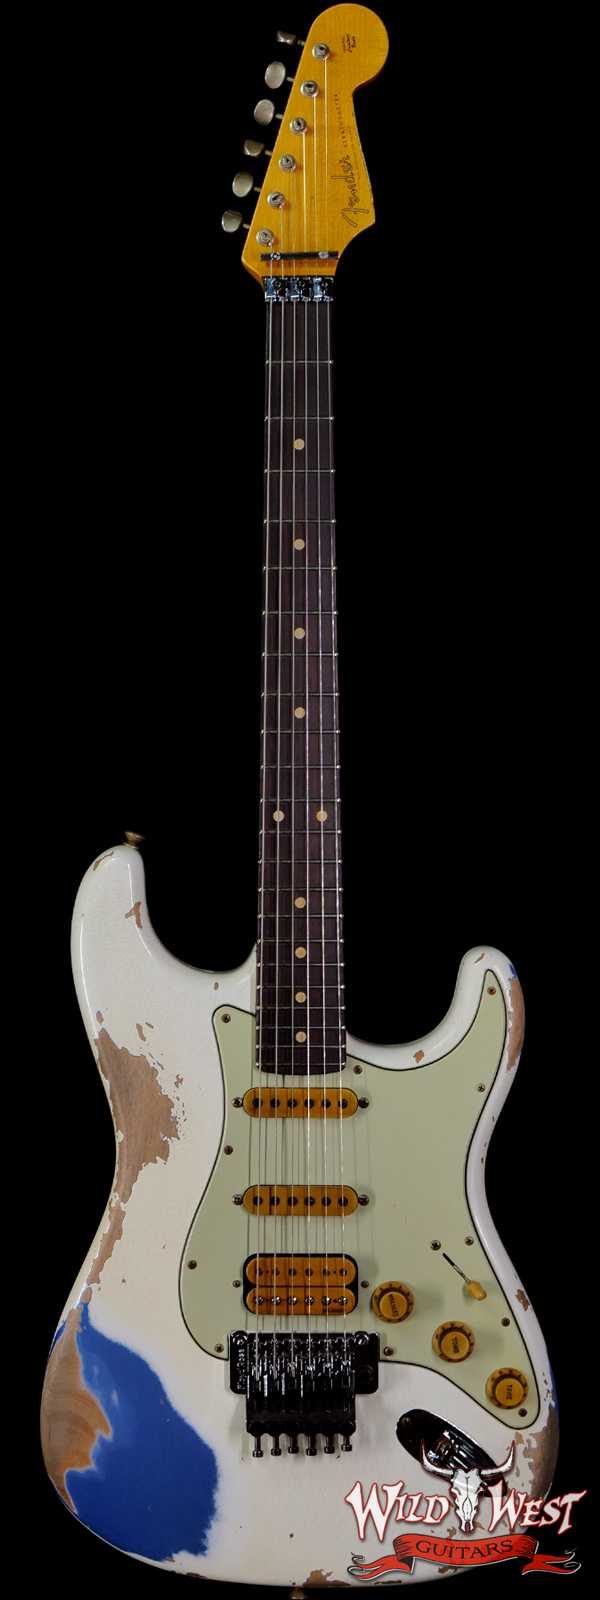 Fender Custom Shop Wild West White Lightning Stratocaster HSS Floyd Rose Rosewood Board 22 Frets Heavy Relic Lake Placid Blue